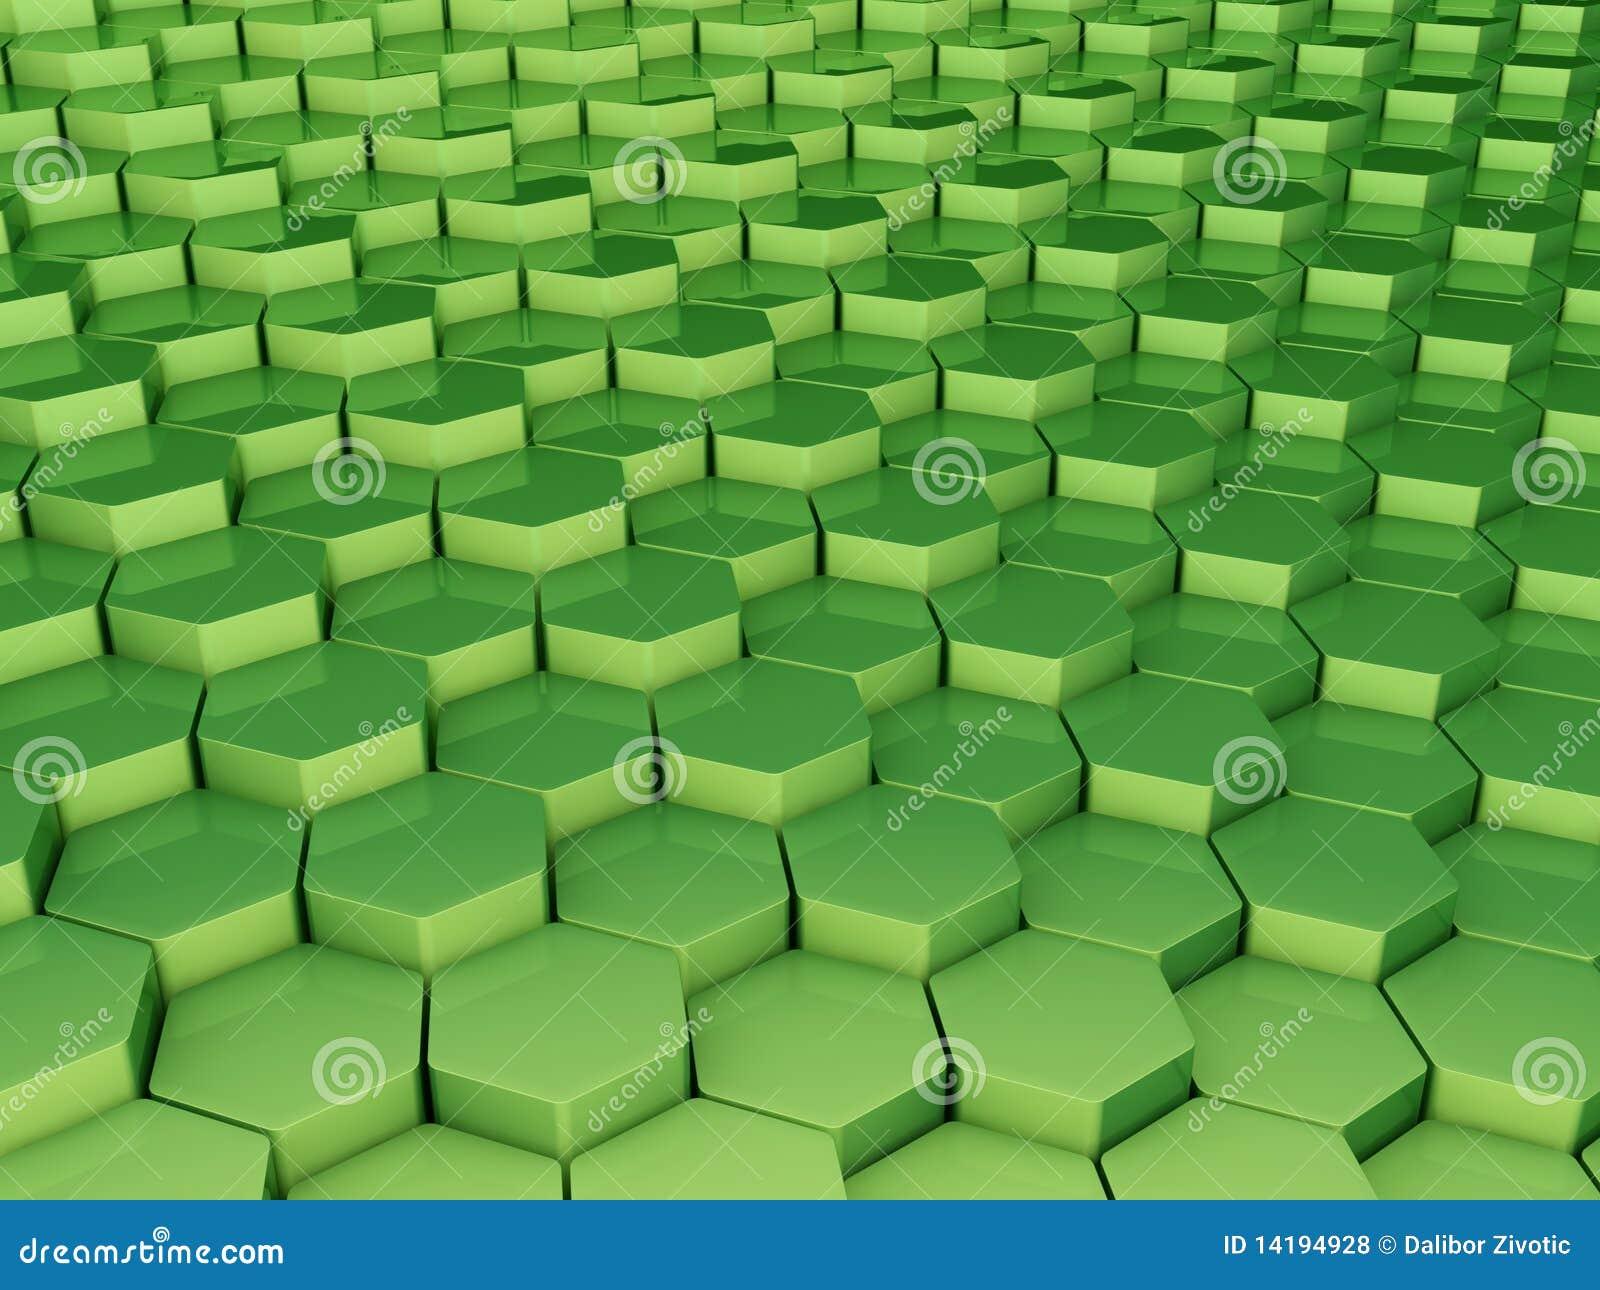 fond 3d vert photos libres de droits image 14194928. Black Bedroom Furniture Sets. Home Design Ideas